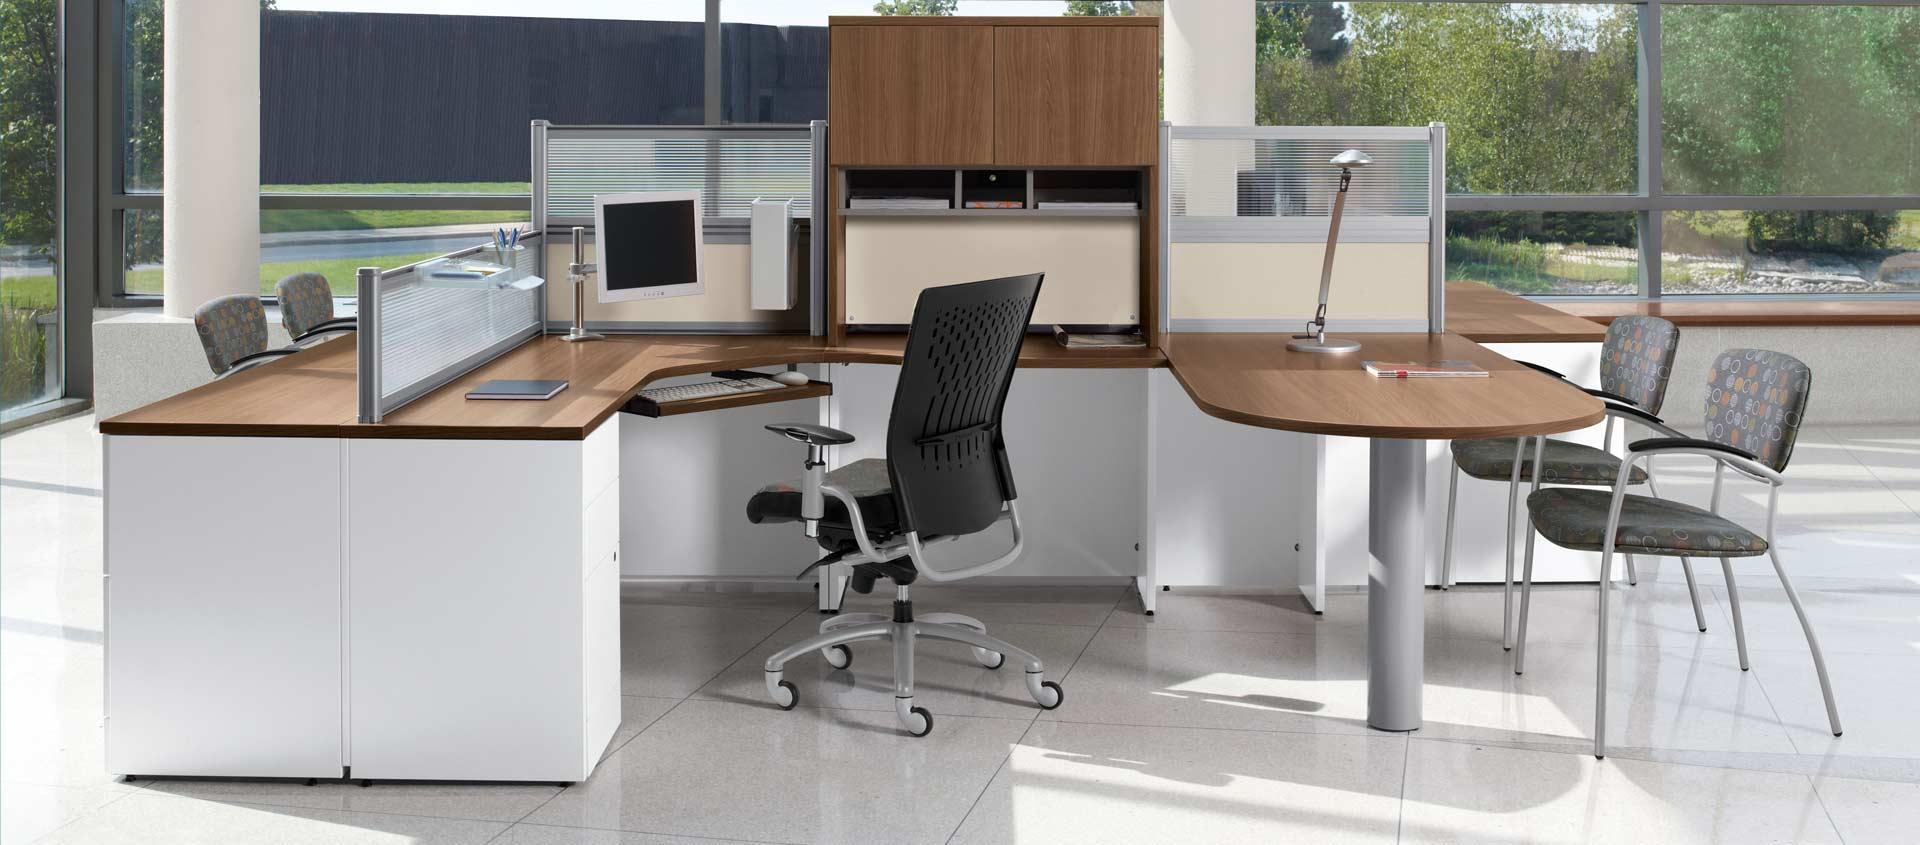 Business office furniture ZNUEUFV